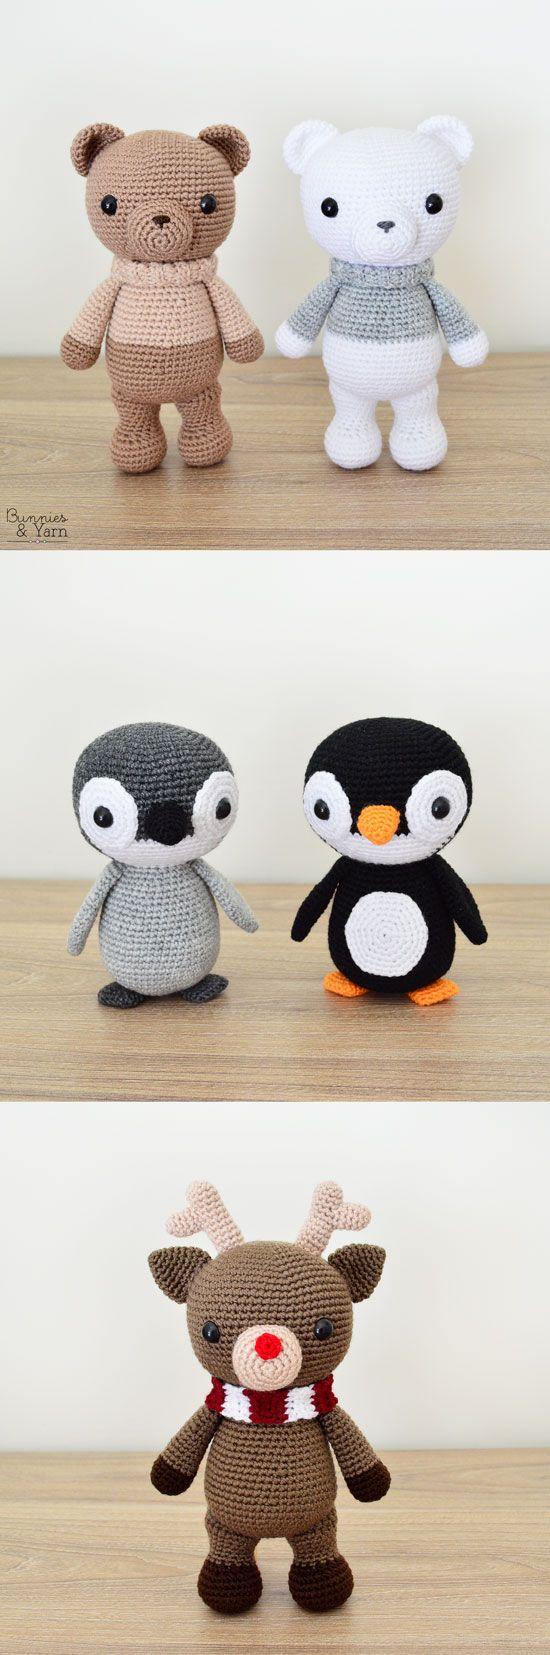 Three Crochet Patterns - Bear, Penguin and Reindeer - Amigurumi